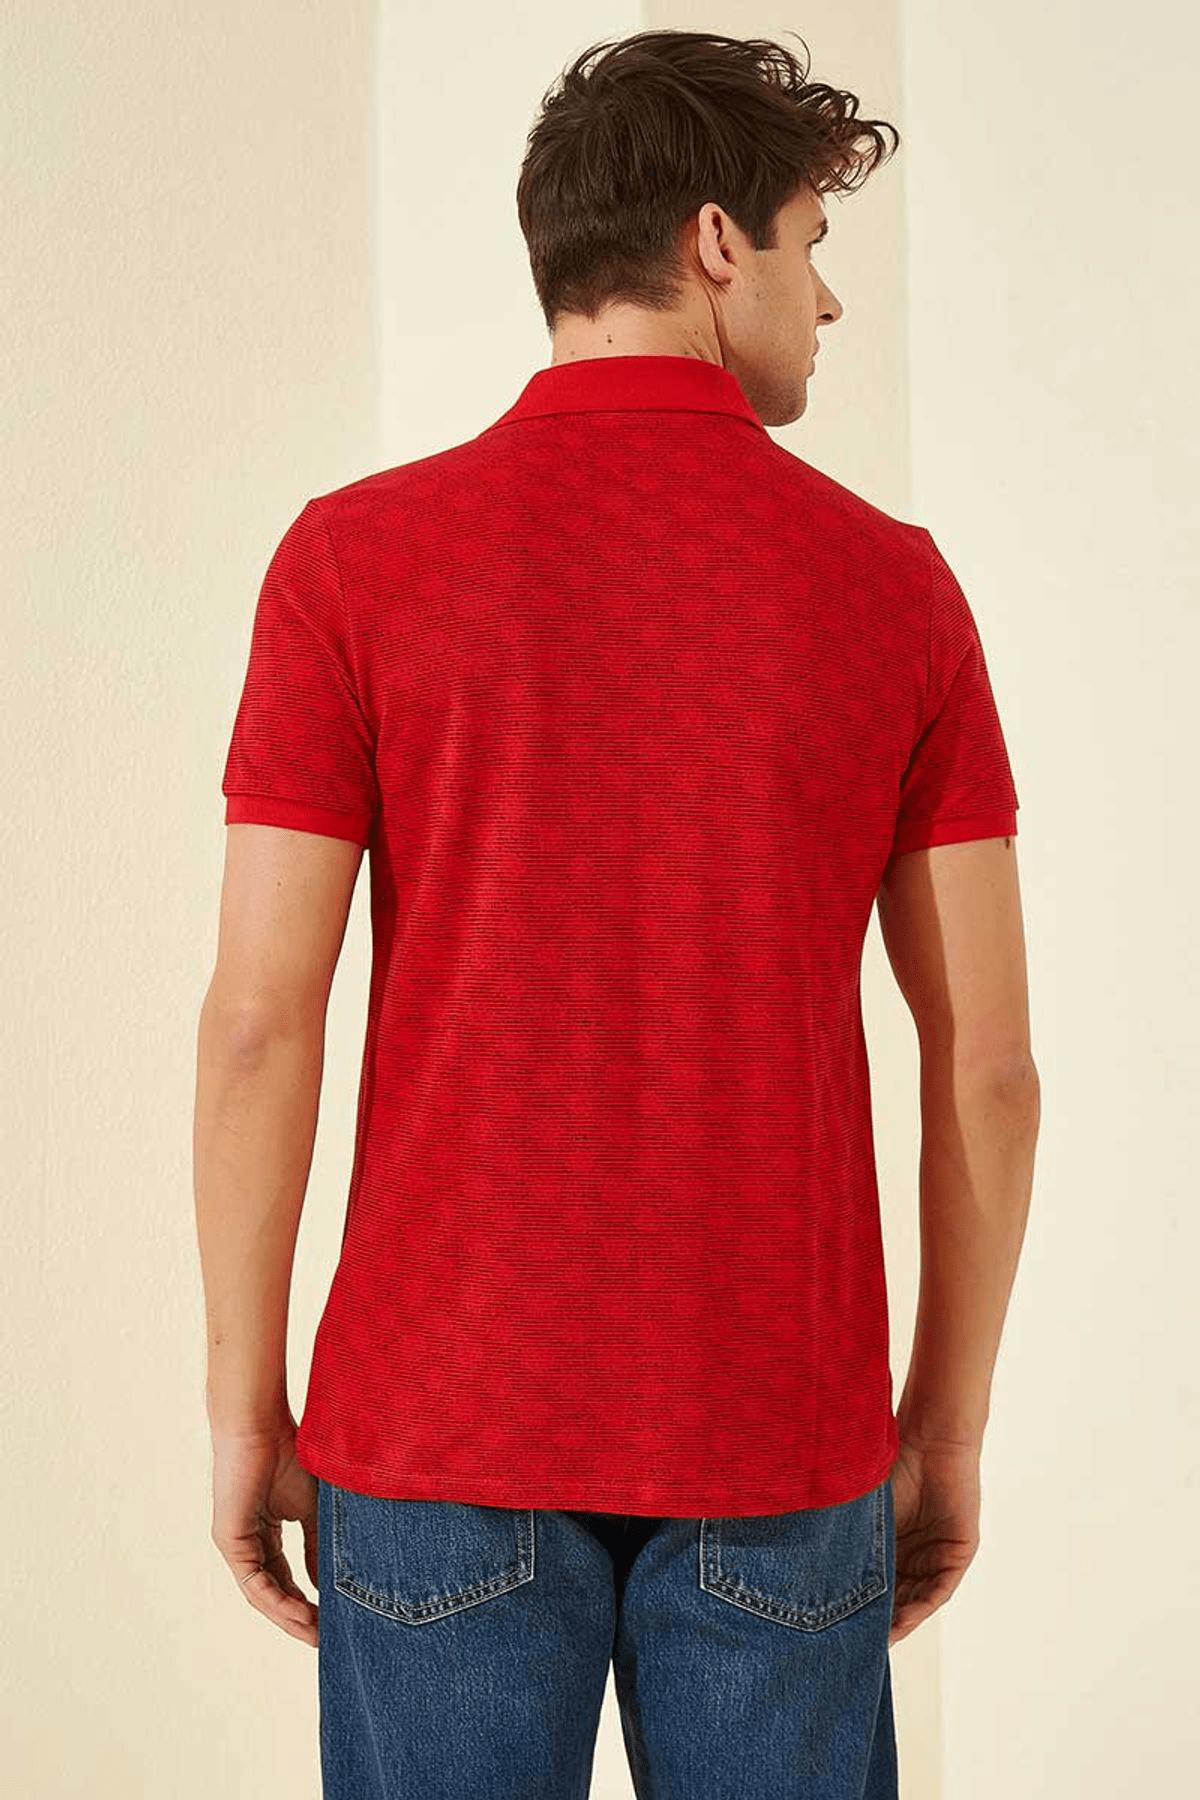 Tommy Life Baskılı Polo Yaka Kırmızı Erkek T-Shirt T08ER-87796_1 4